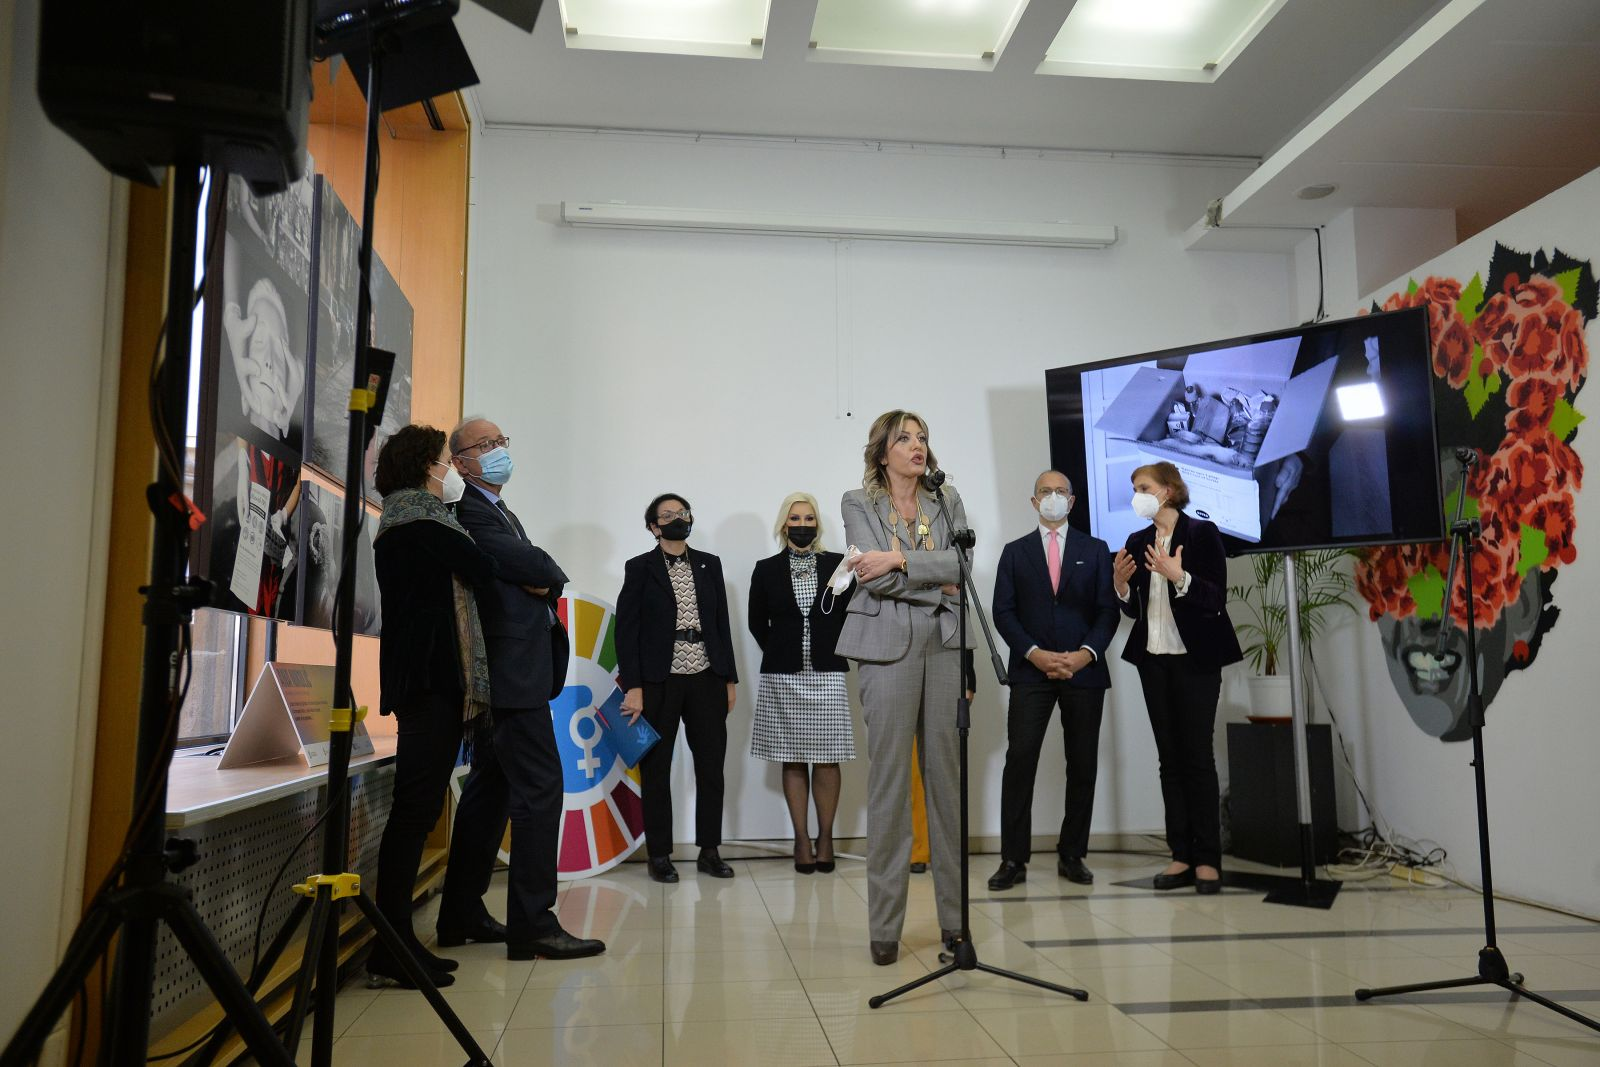 J. Joksimović: Immeasurable role of women in overcoming pandemic